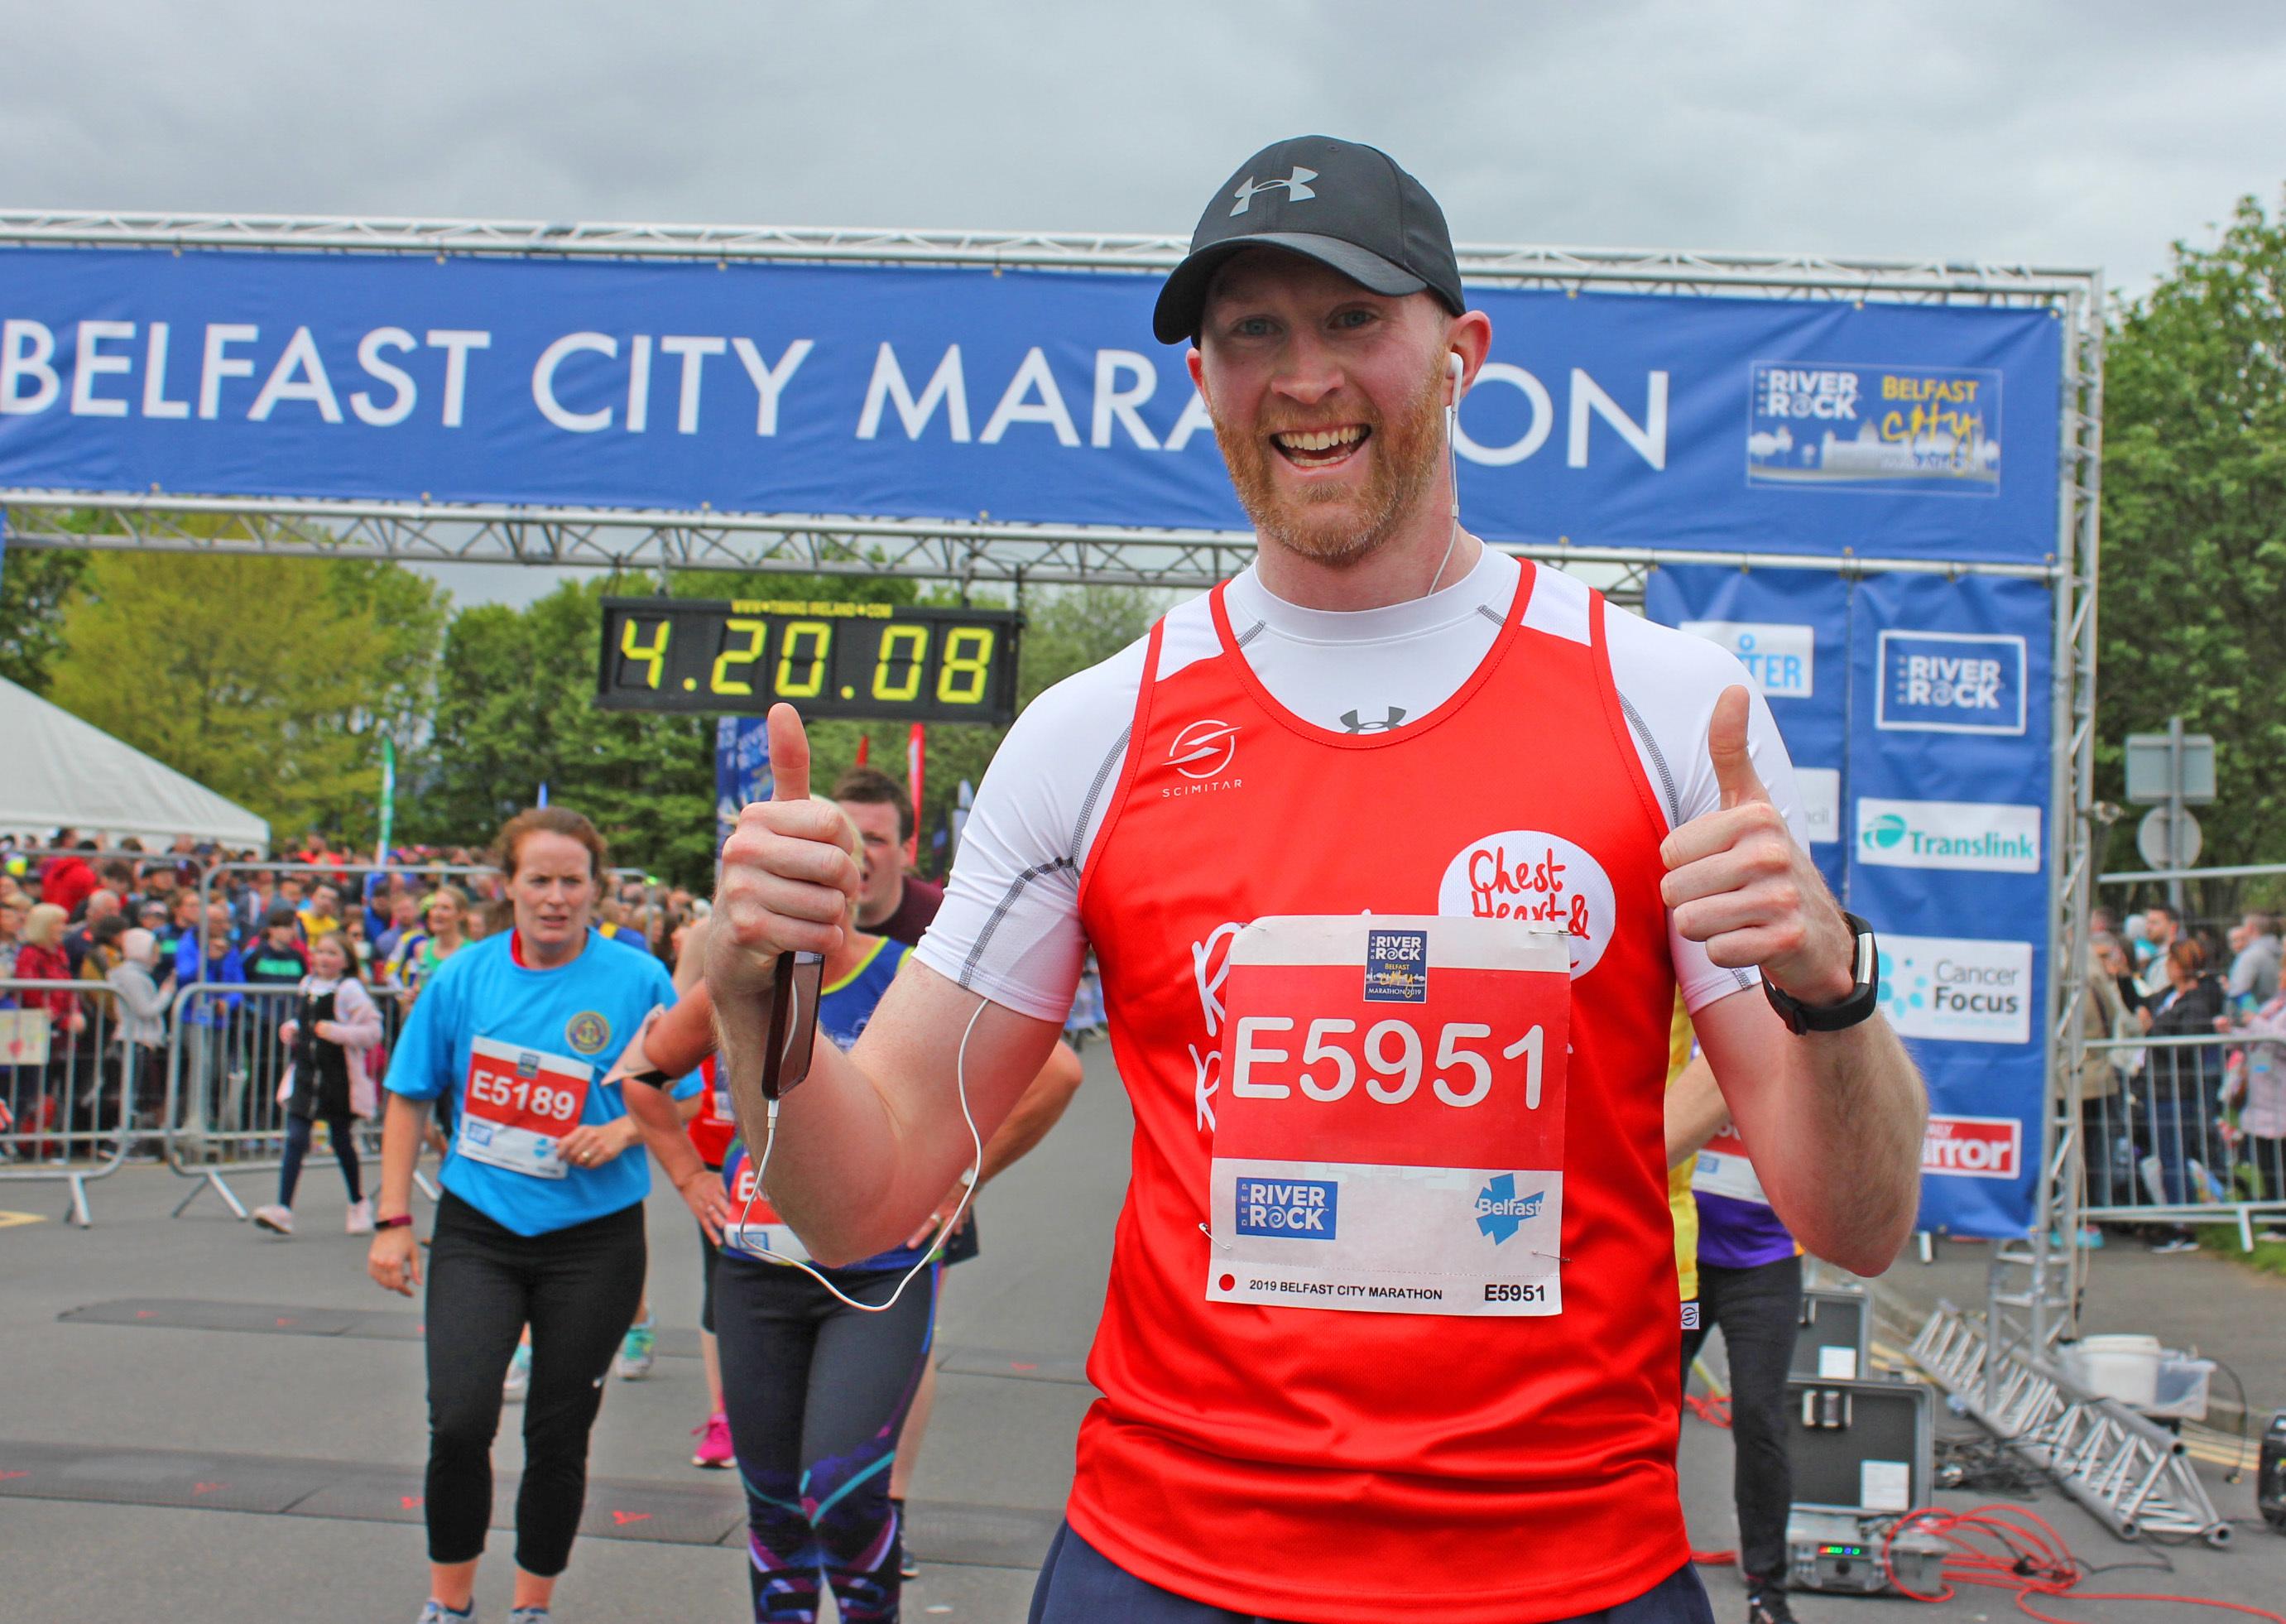 Belfast City Marathon - Registration now closed